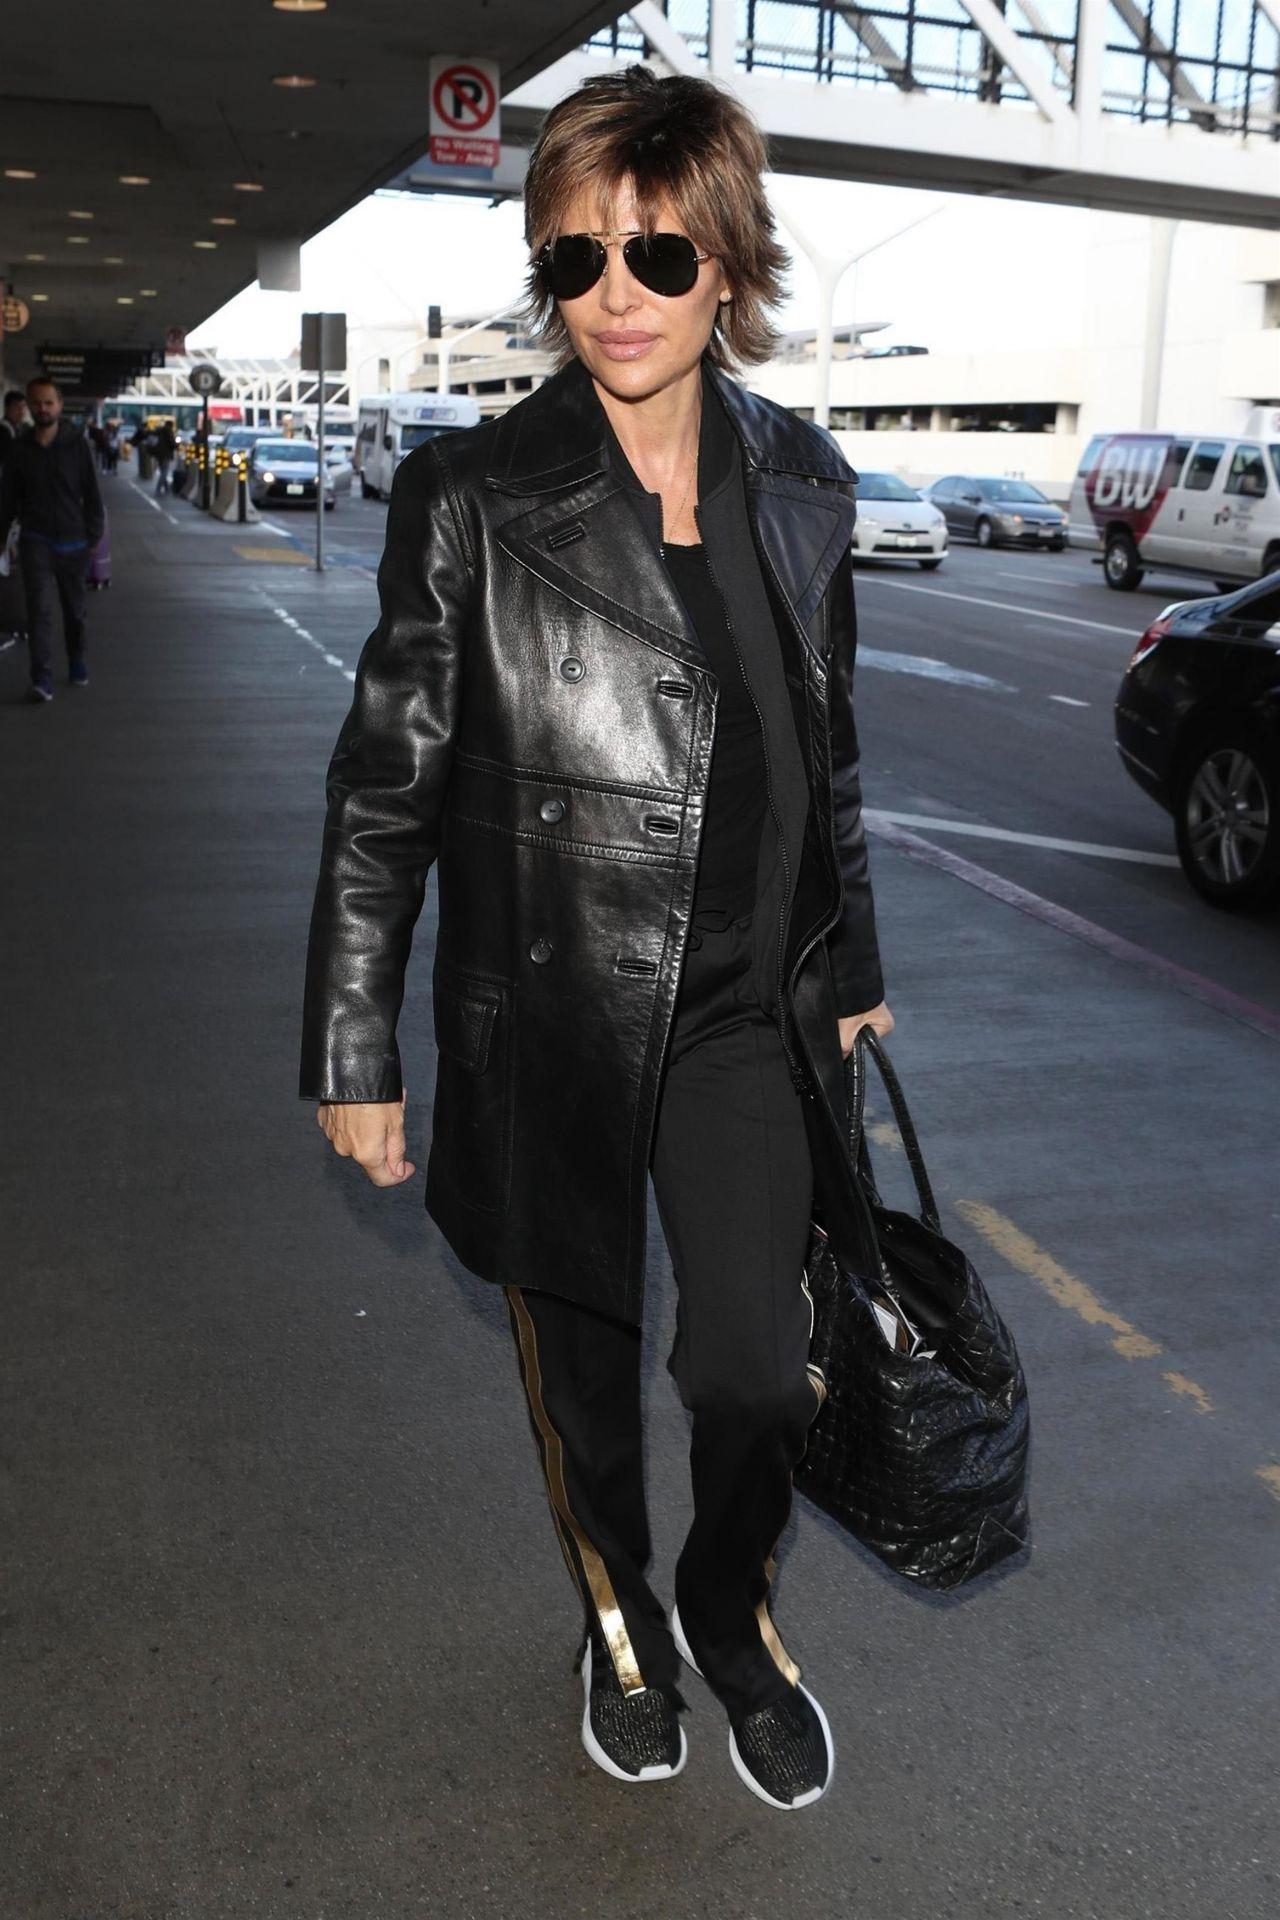 Lisa Rinna Los Angeles Lax Airport 02 27 2018